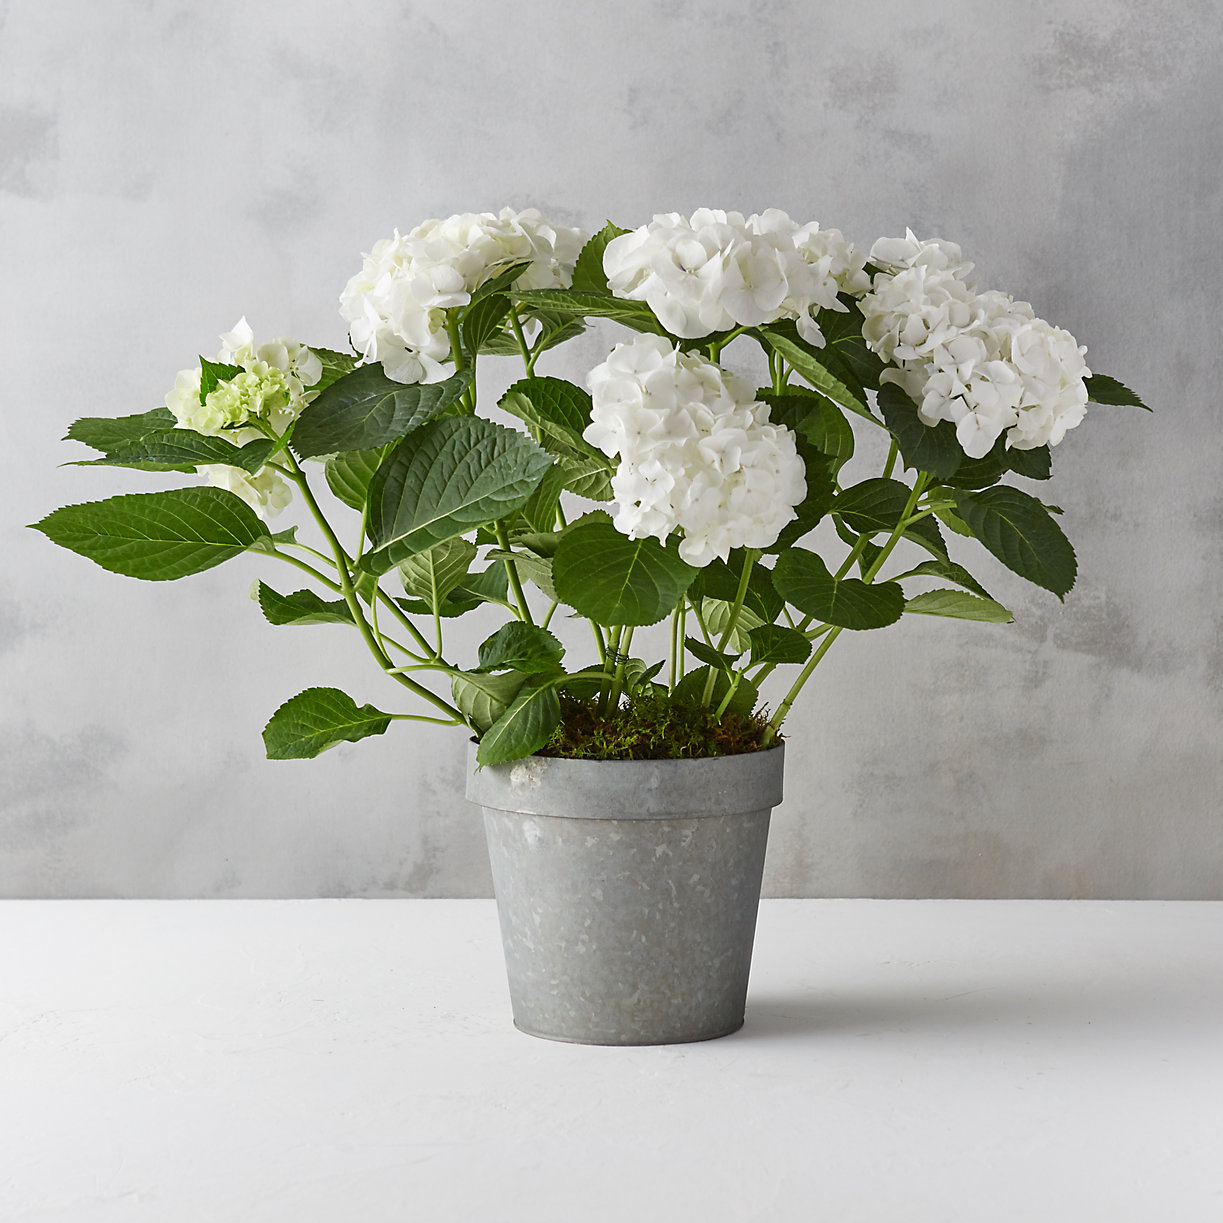 white hydrangea zinc flower pot loading zoom - White Hydrangea